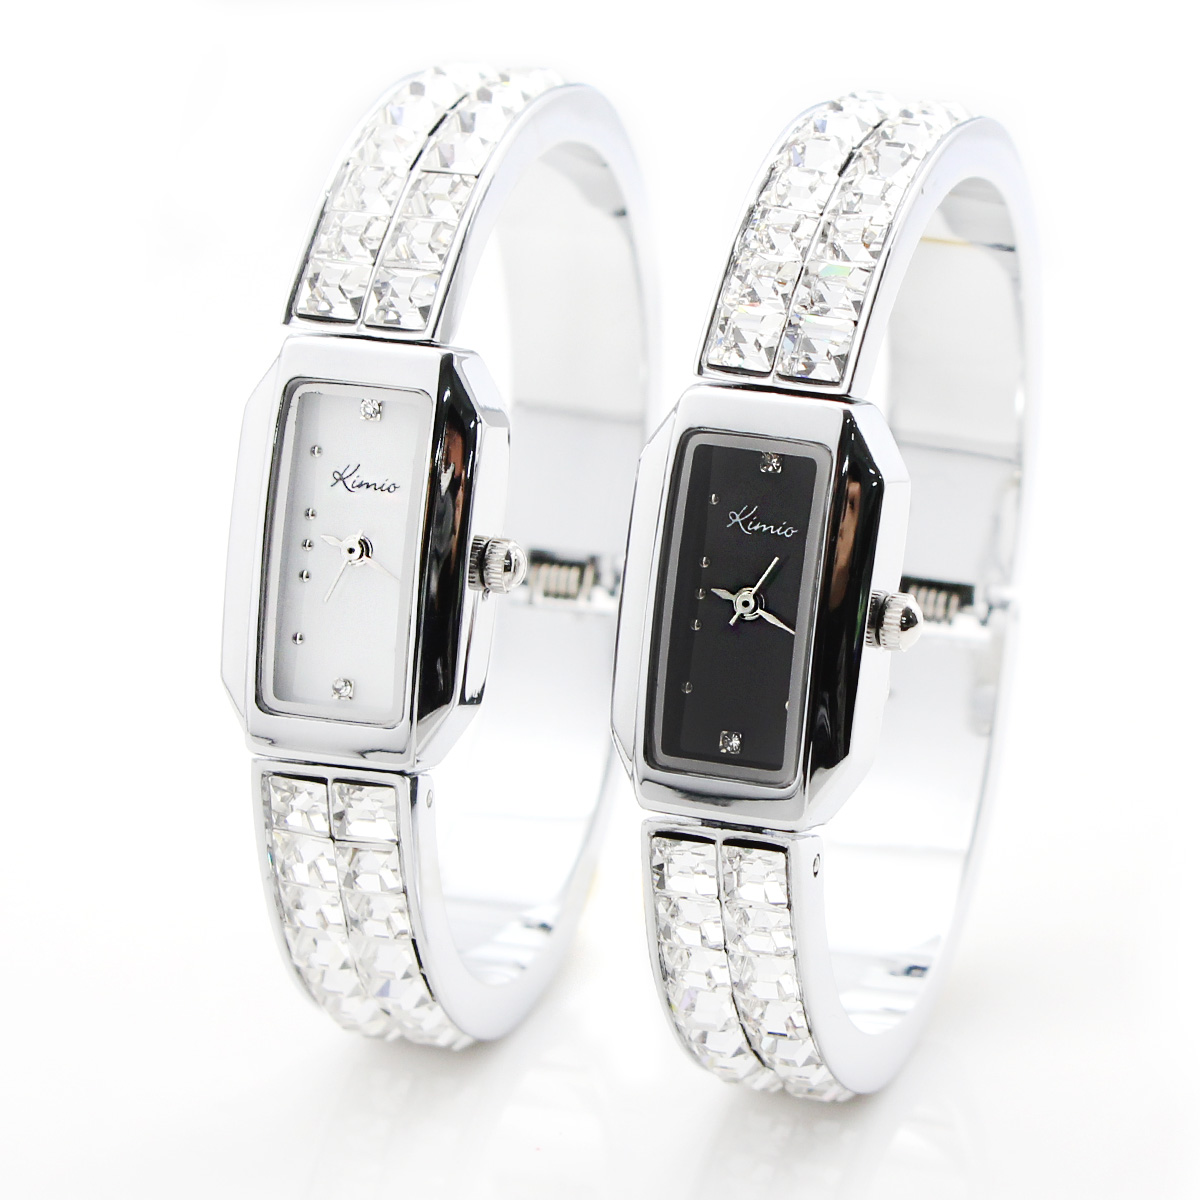 Часы Kimio 358 Кварцевые часы Женские Китай 2011